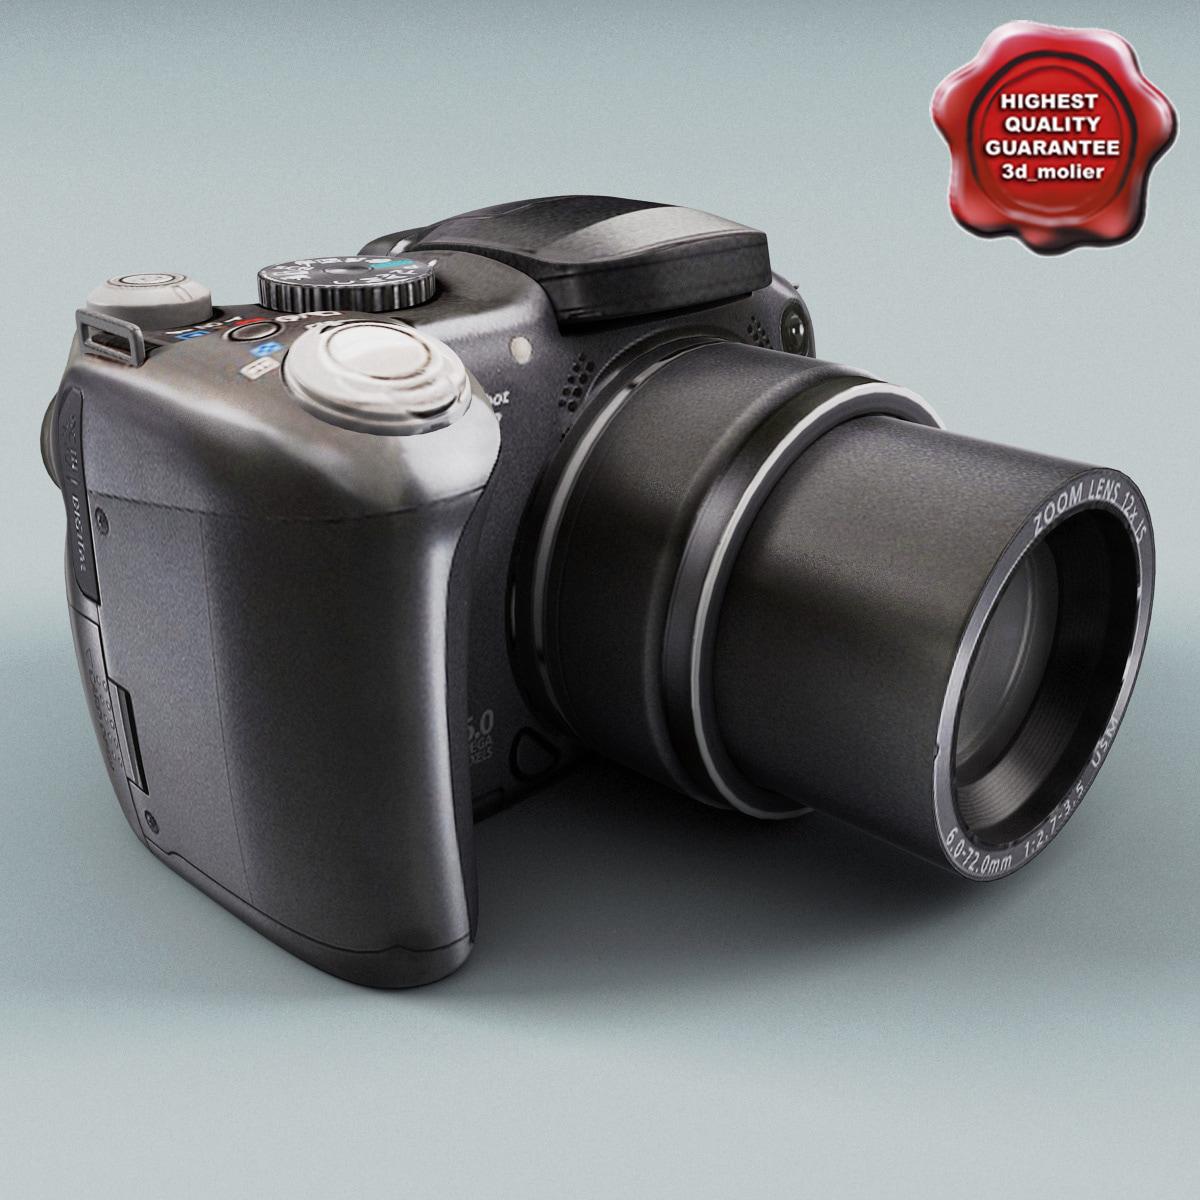 Low_Poly_Photo_Camera_V2_00.jpg